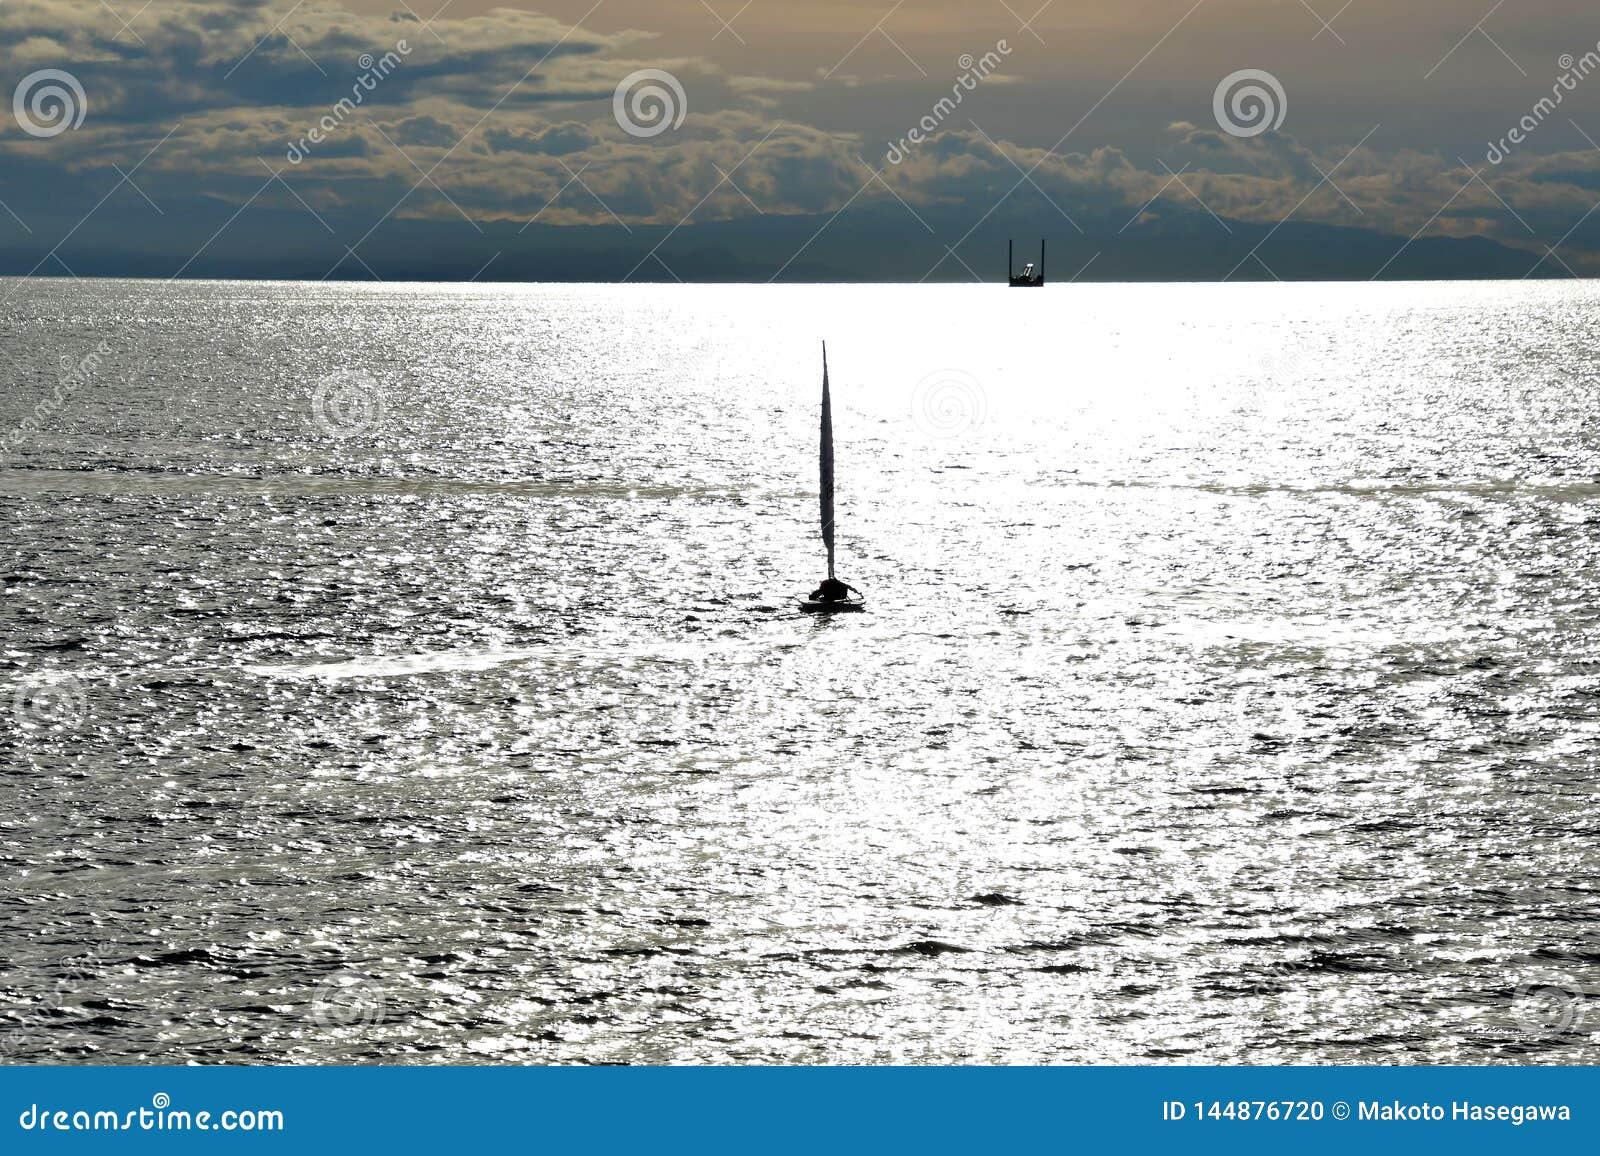 La gente impara come navigare una barca